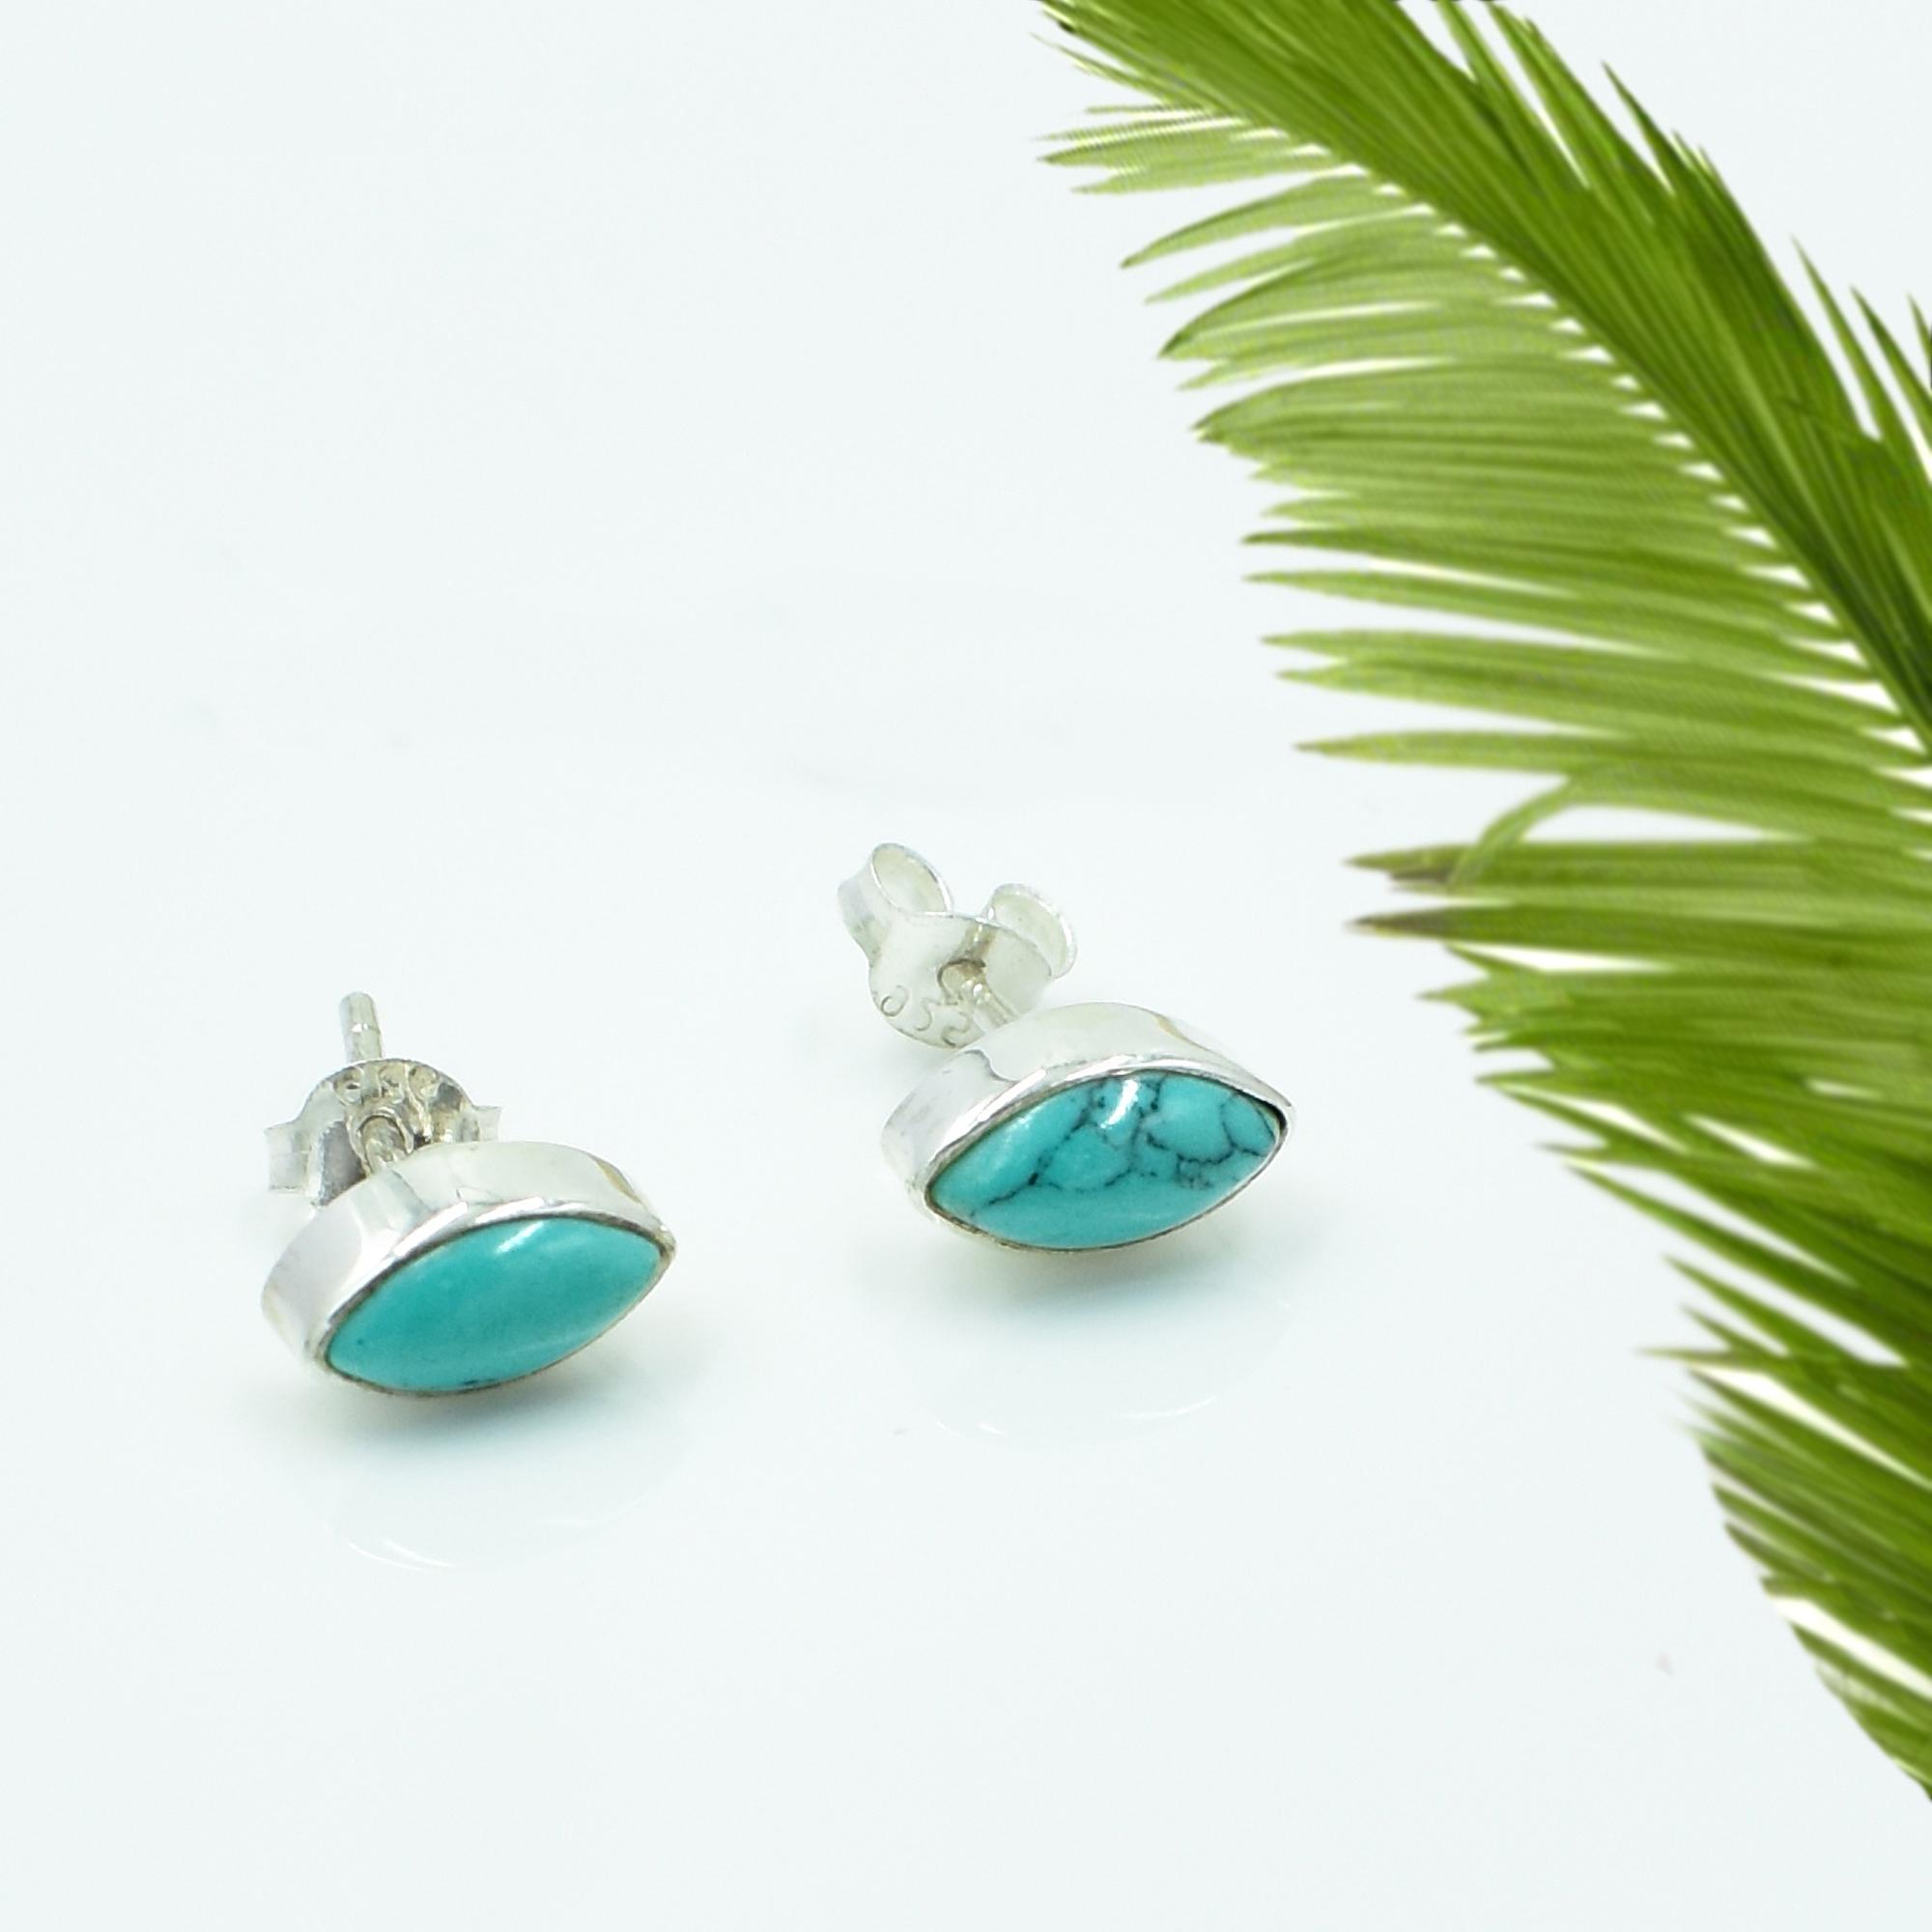 Blue Turquoise Oval Gemstone 925 Sterling Silver Post Stud Earring For women & Girls